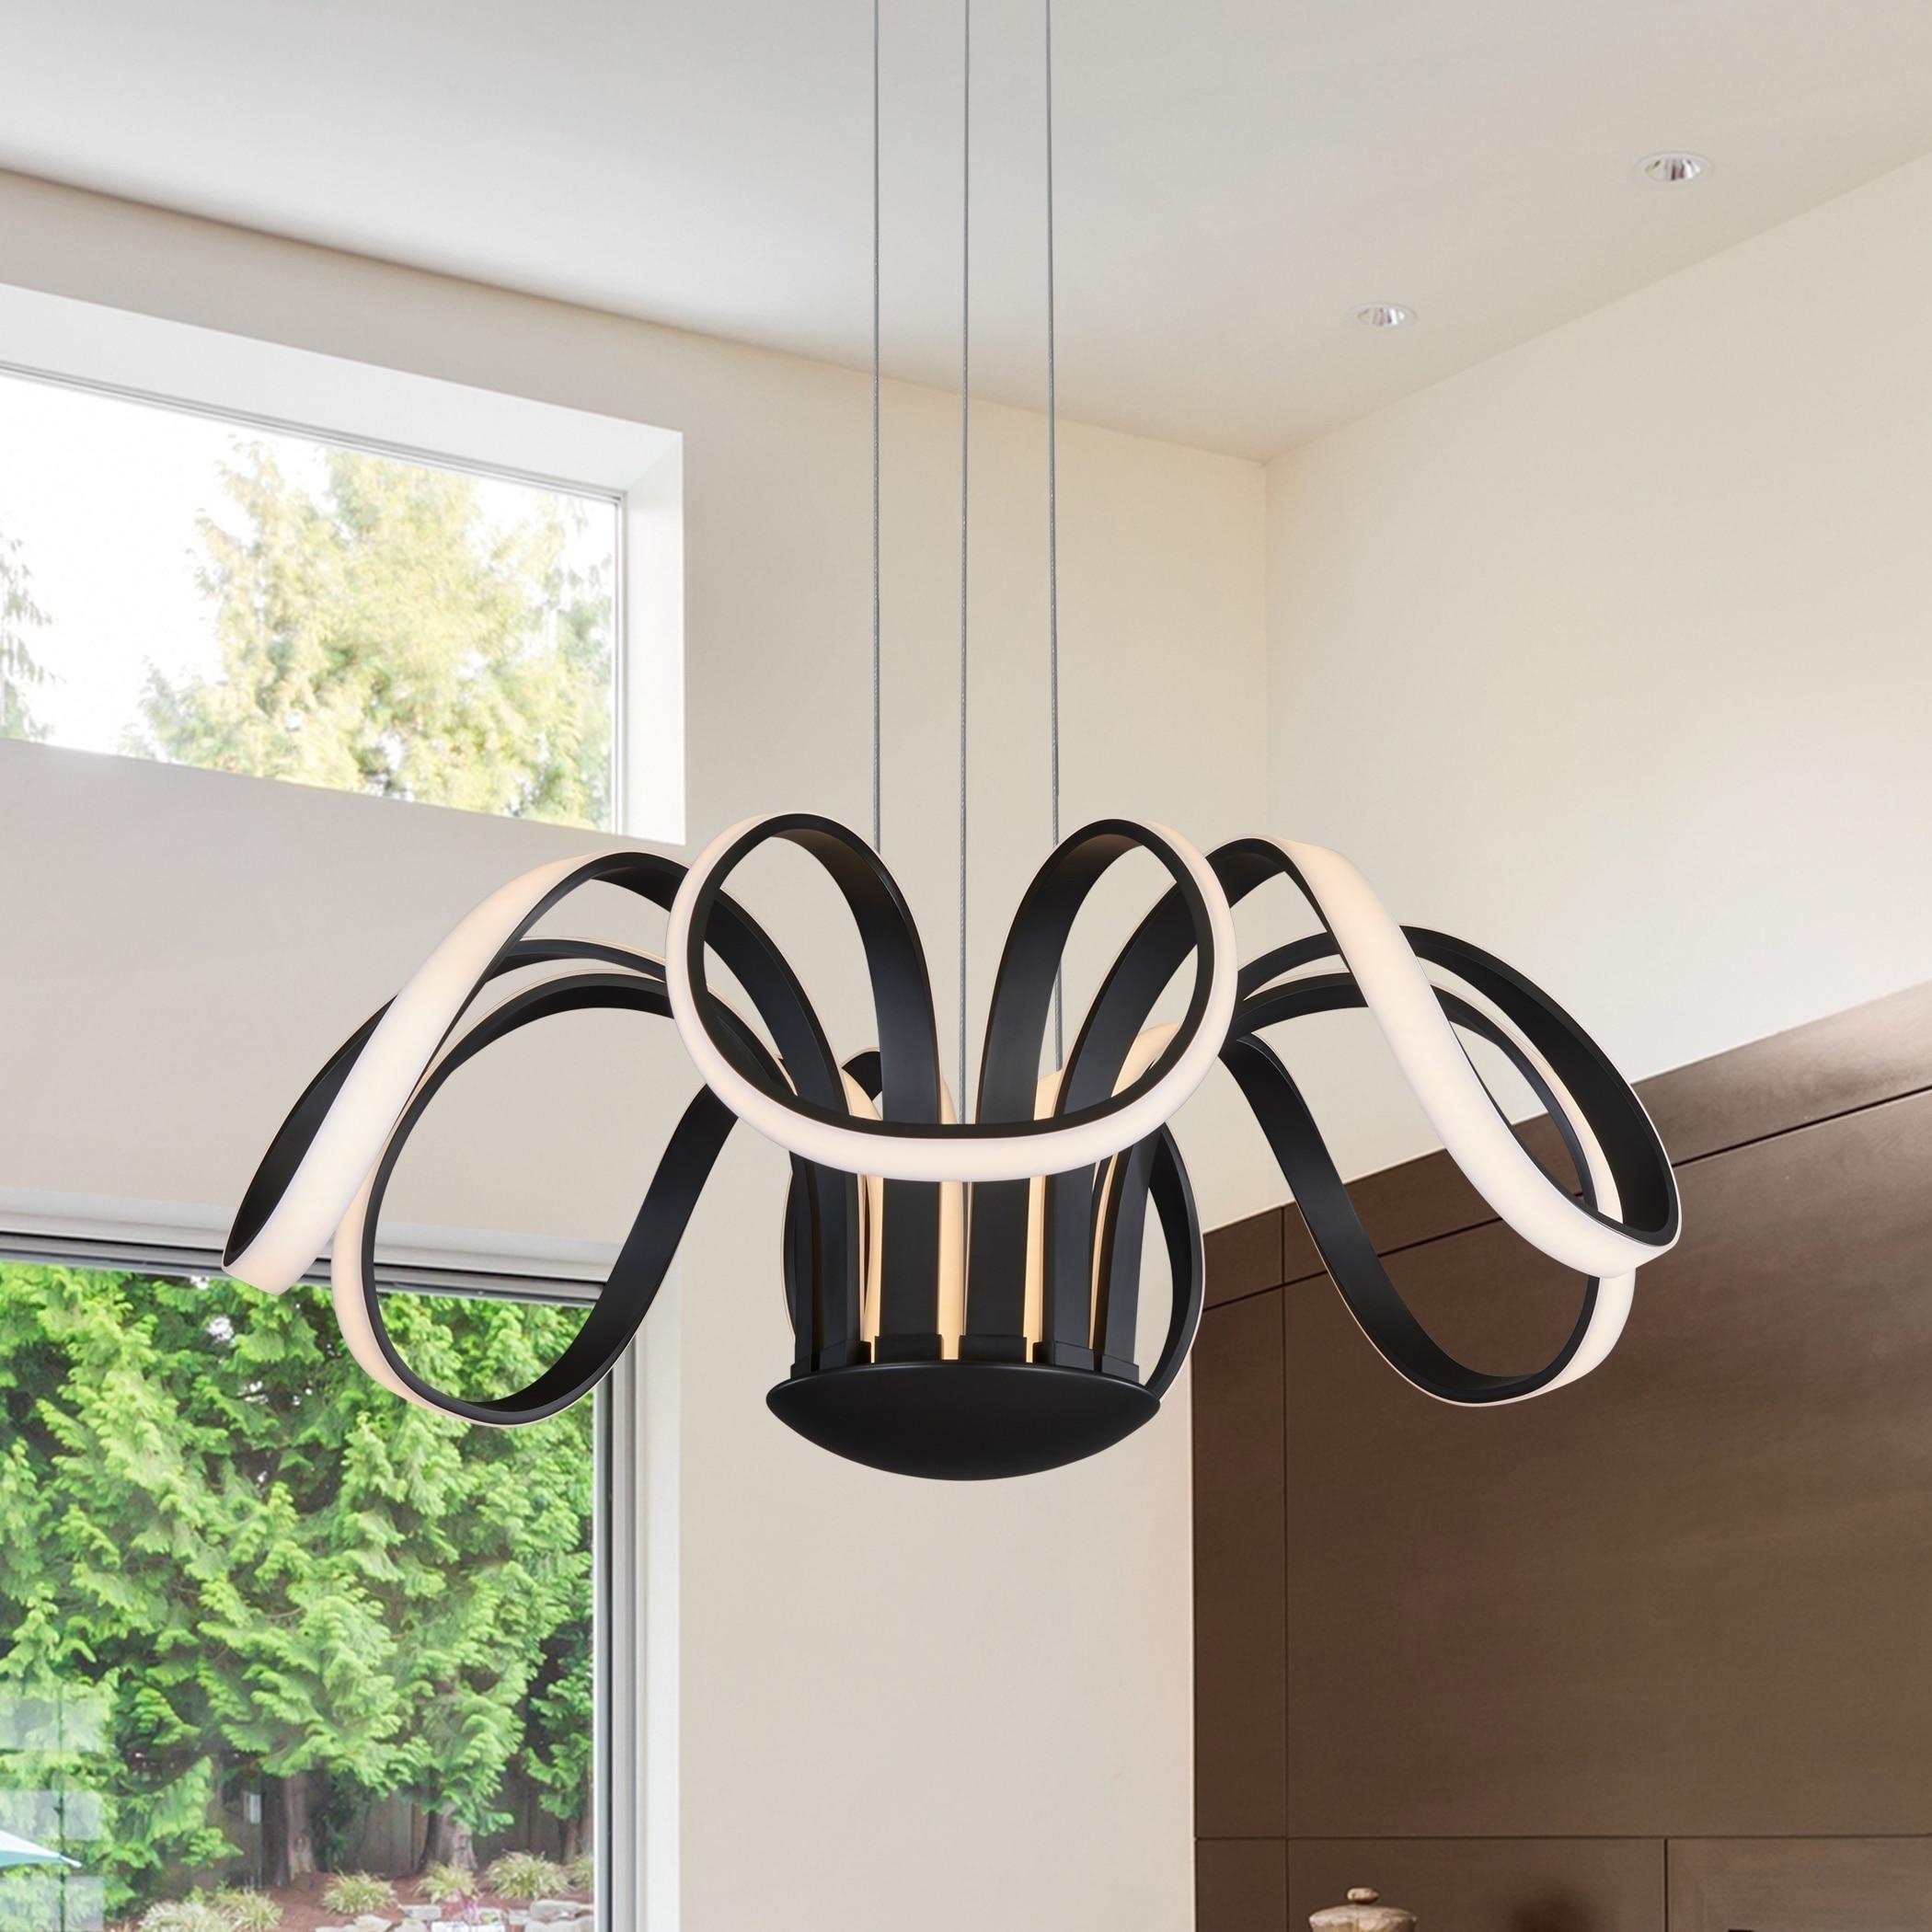 Vonn Lighting Capella 30-inches LED Adjustable Hanging Li...